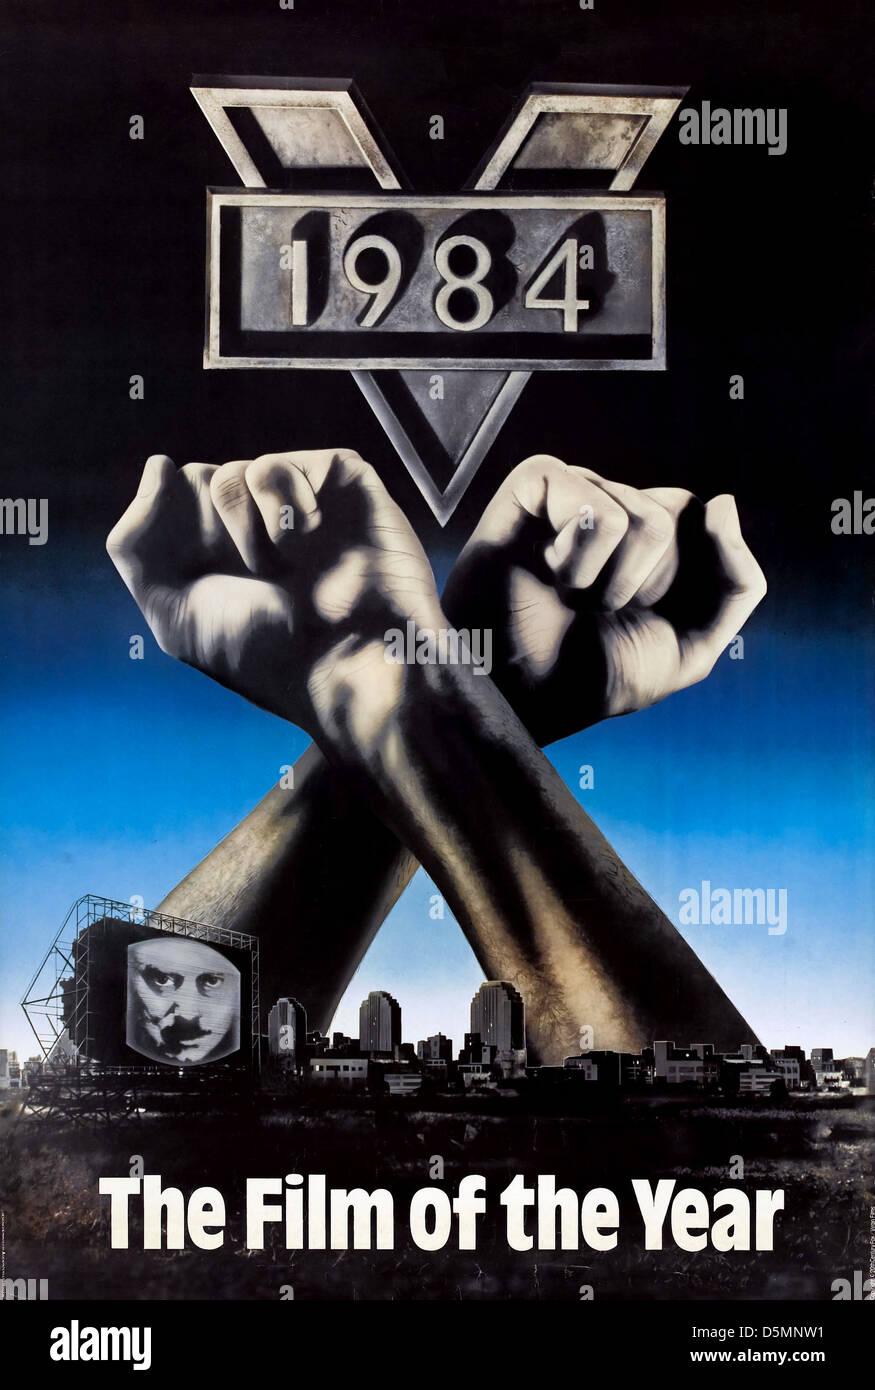 Movie Poster 1984 Nineteen Eighty Four 1984 Stock Photo 55160589